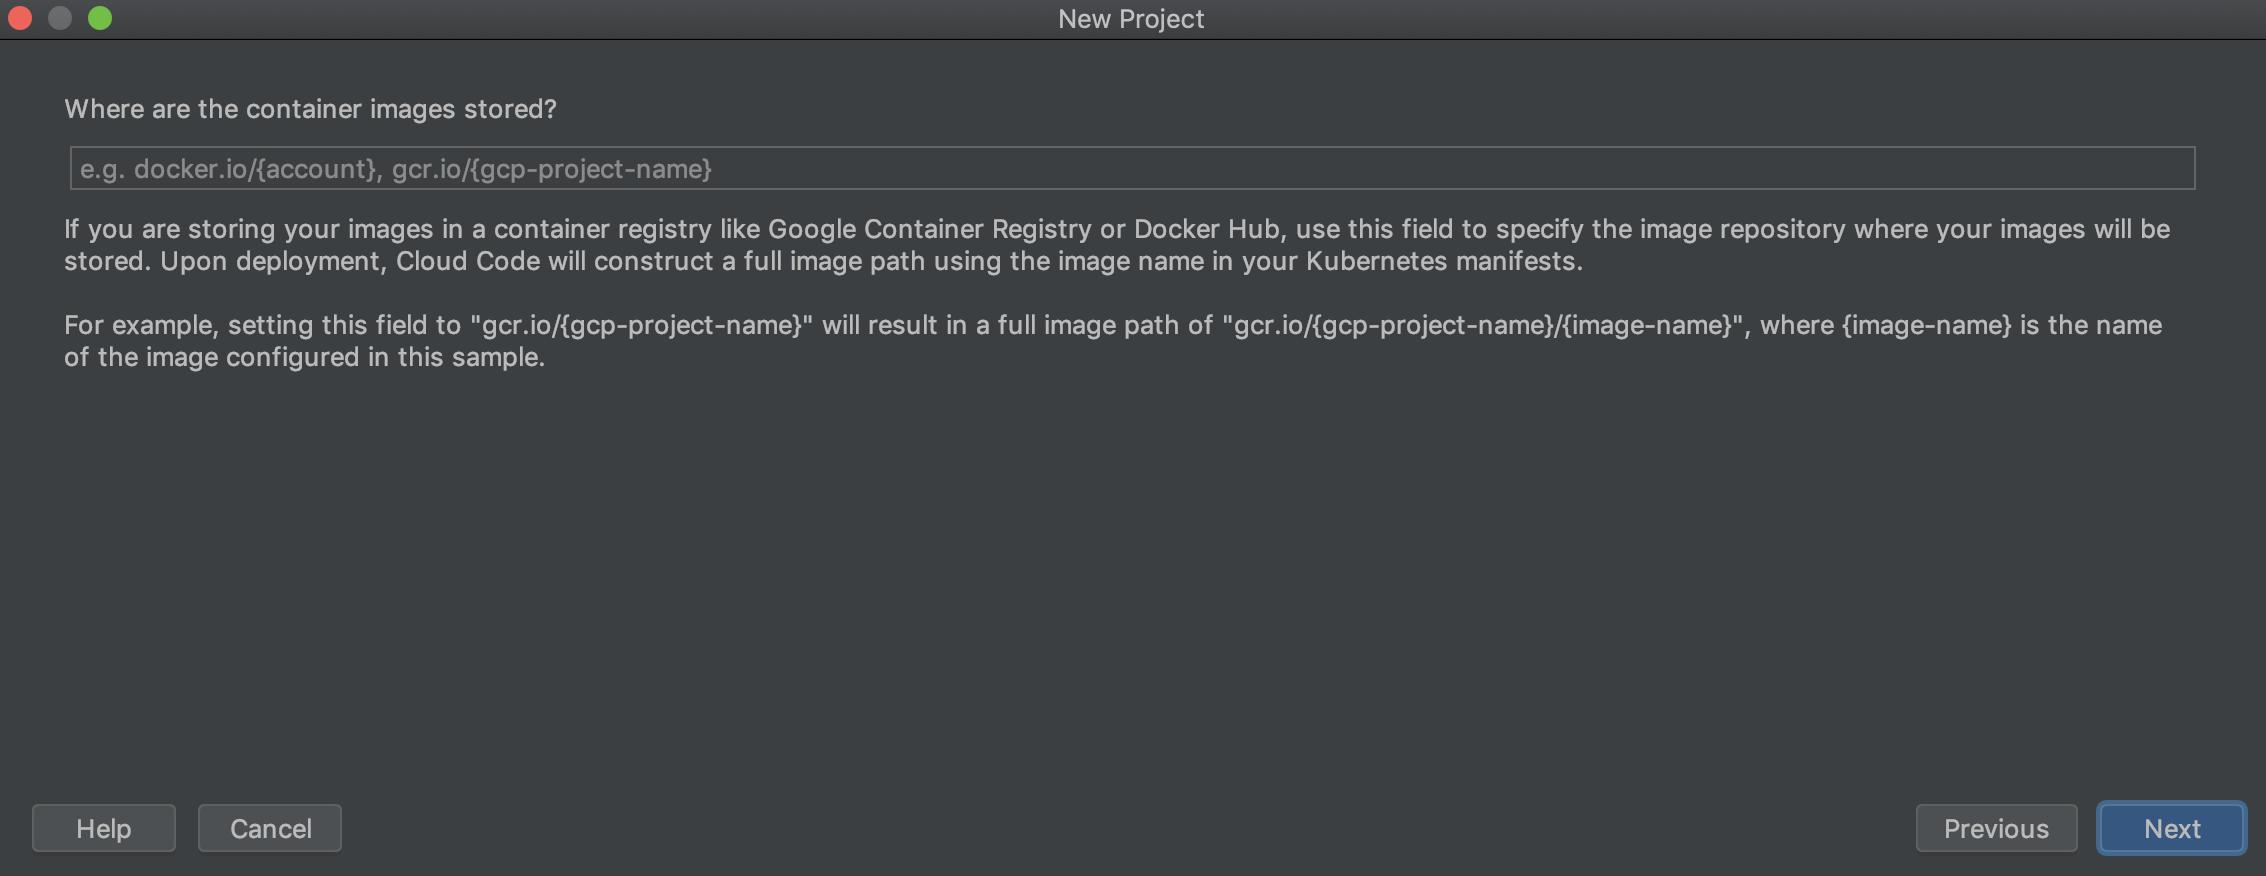 gcr.io/{gcp-project-name} 또는 docker.io/{account} 형식을 사용하여 필드에서 기본 이미지 저장소를 지정합니다.